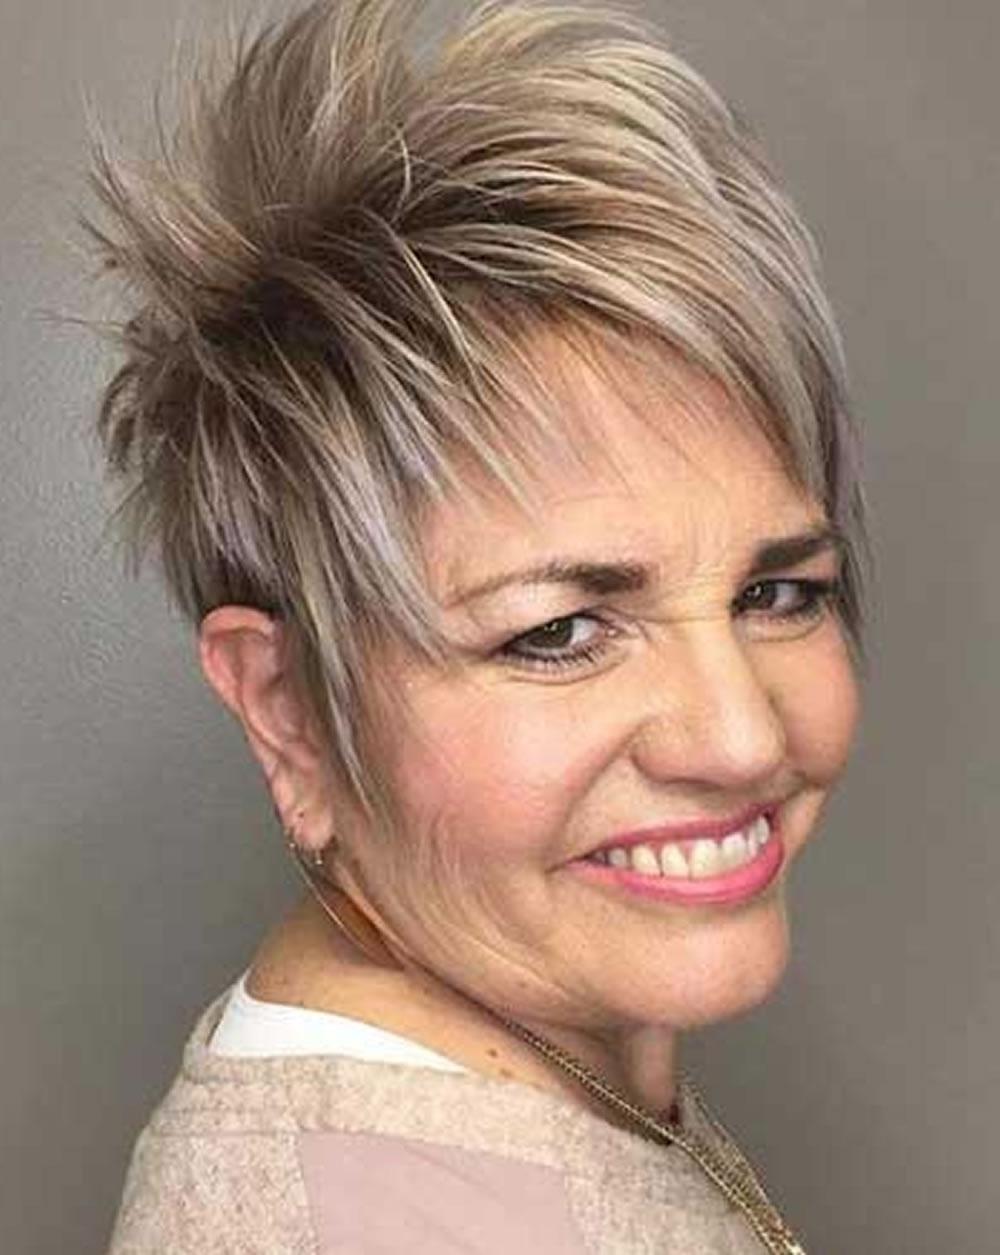 Bob Haircuts For Over 50 Hrotelrehberii